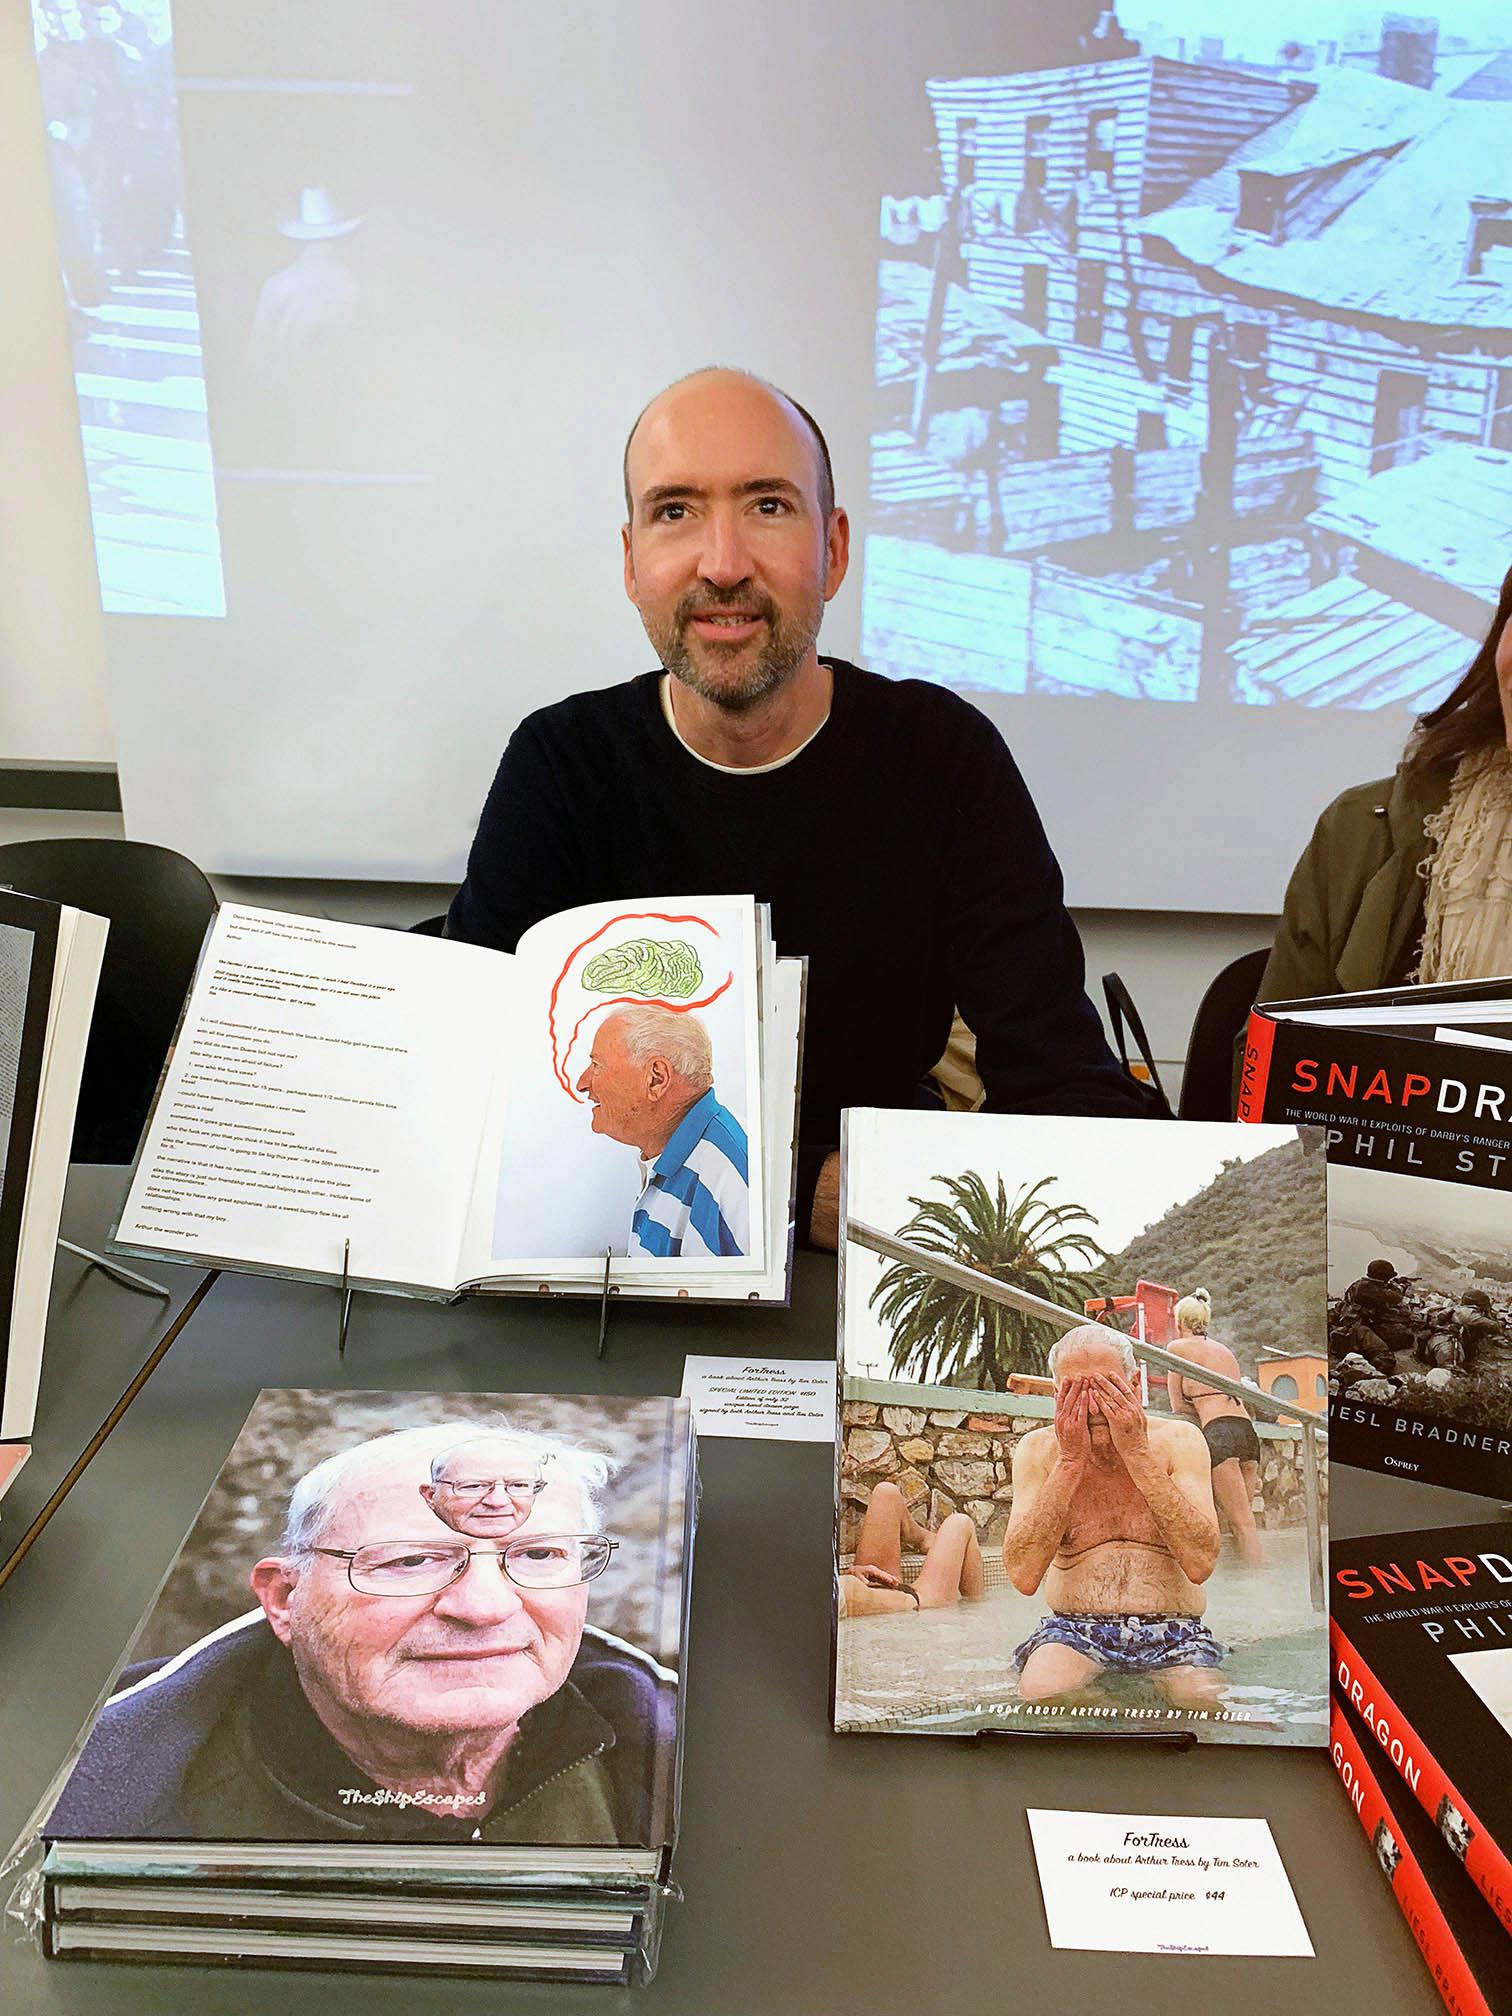 Tim Soter at International Center of Photography Book Fair.